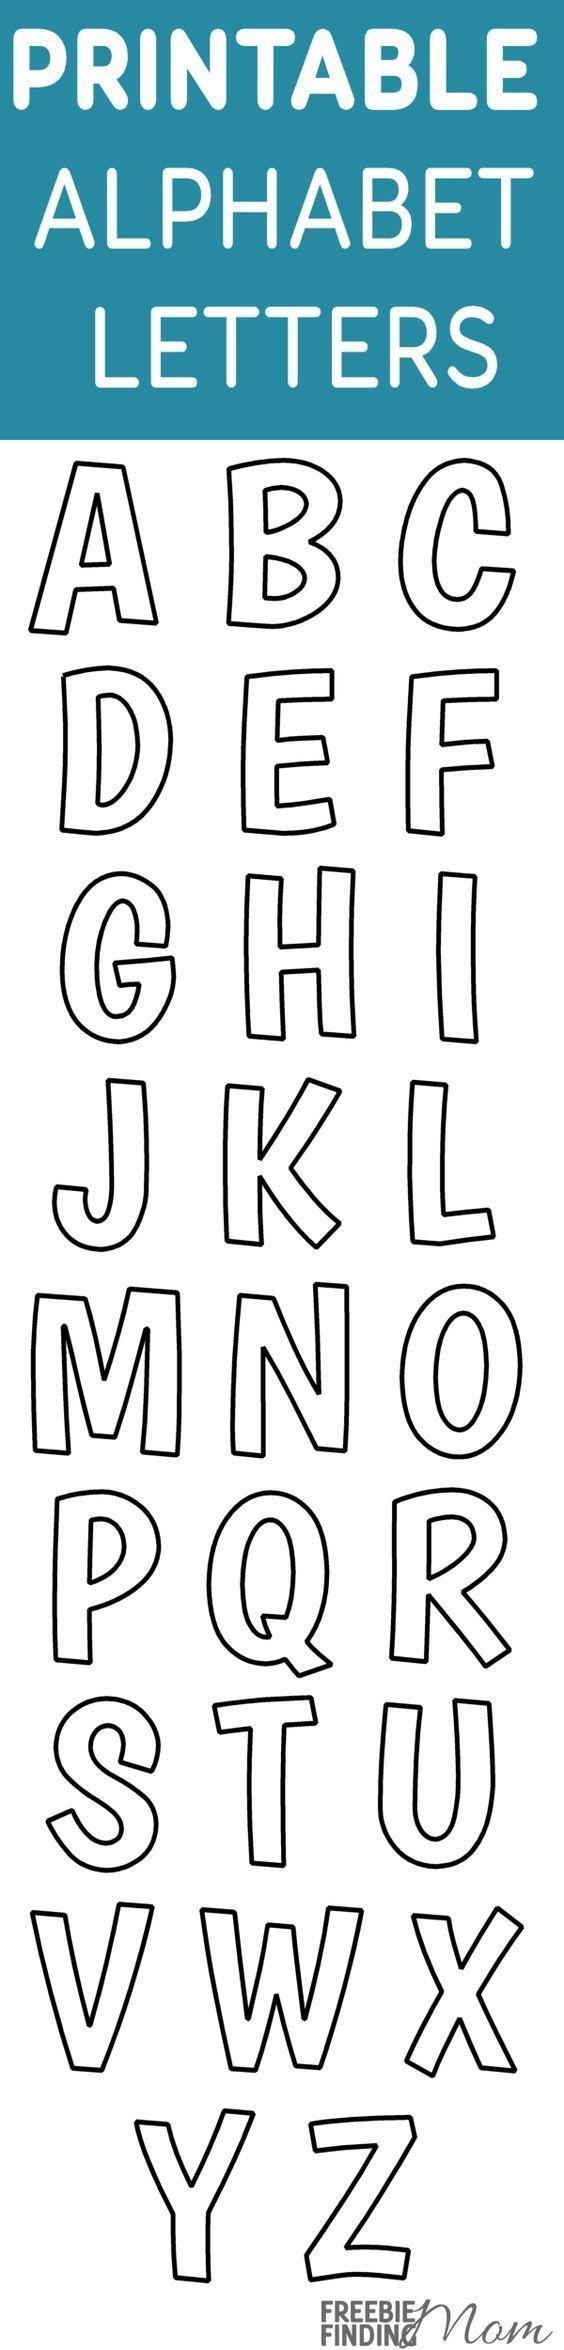 Printable Free Alphabet Templates | Painting Ideas | Alphabet - Free Printable Alphabet Stencil Patterns